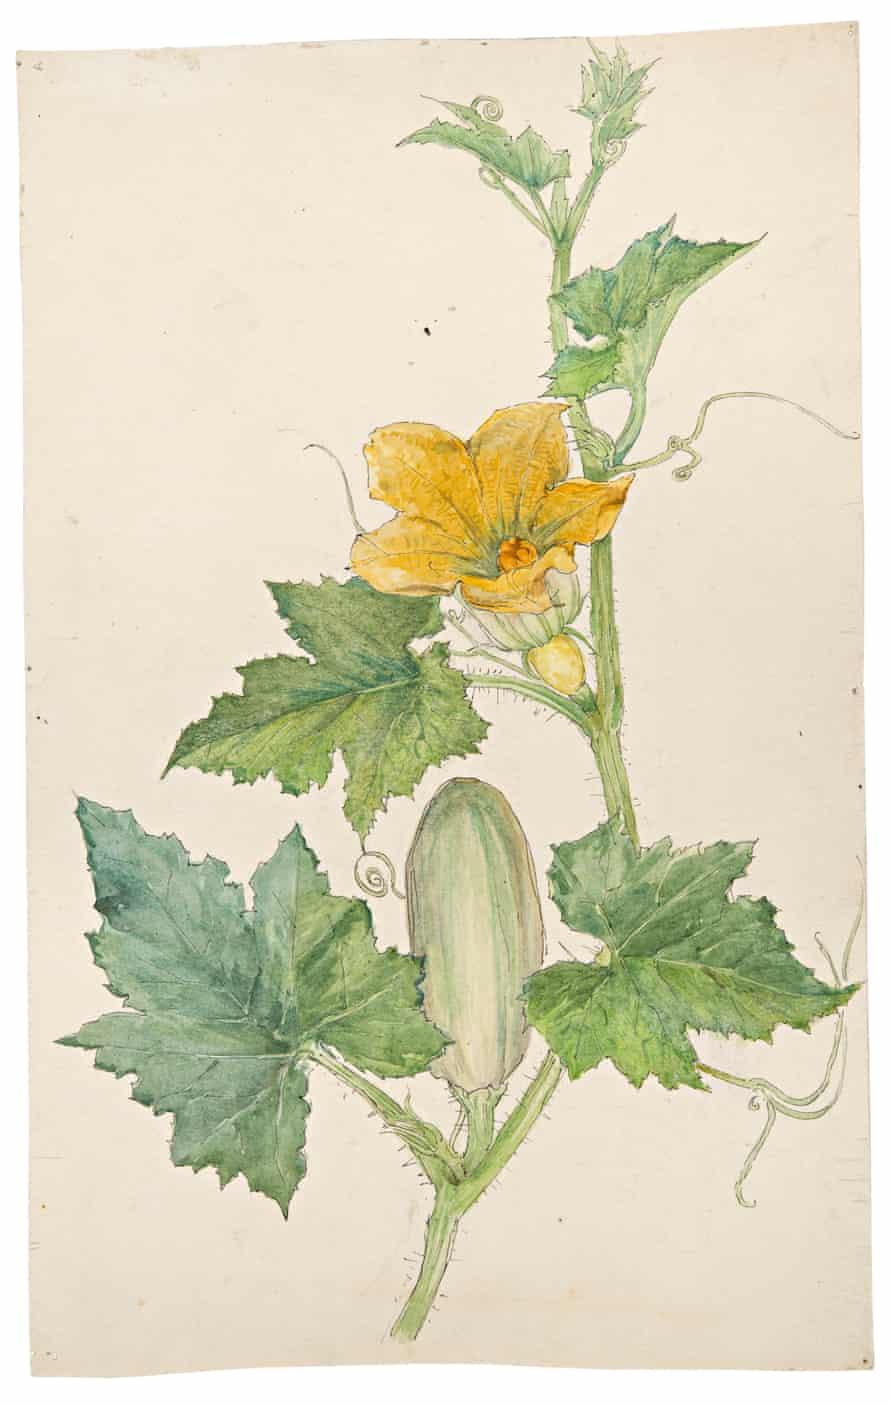 An 1890s botanical study of a cucumber plant